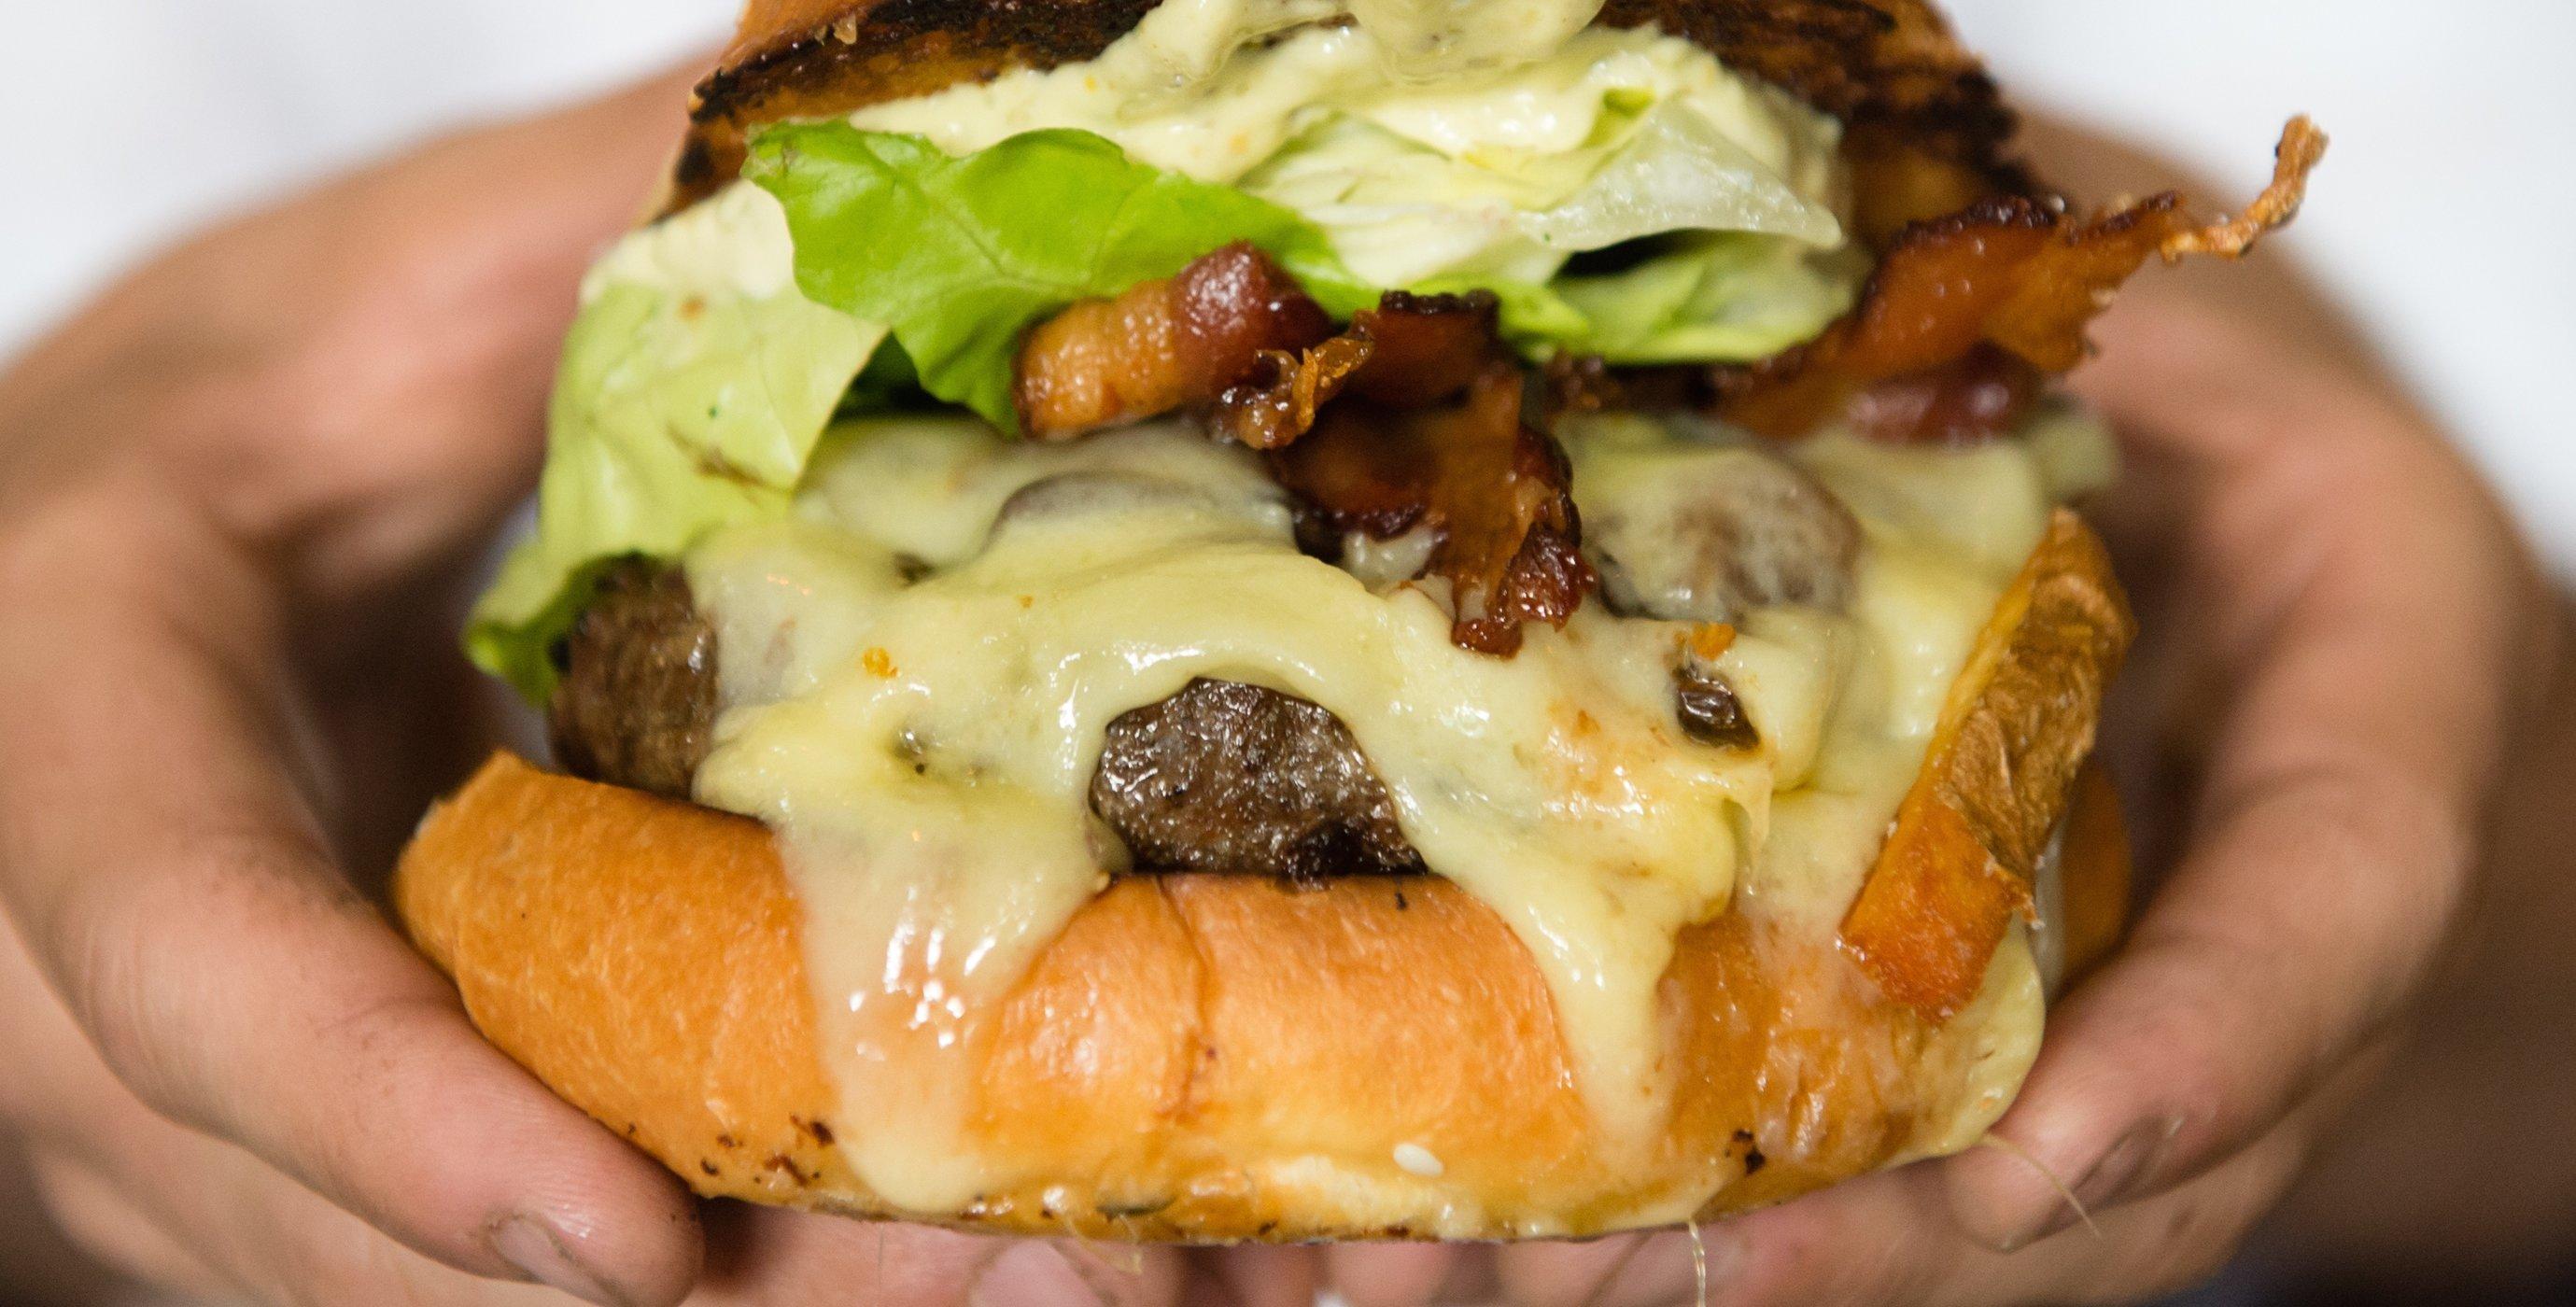 la bete burger seattle